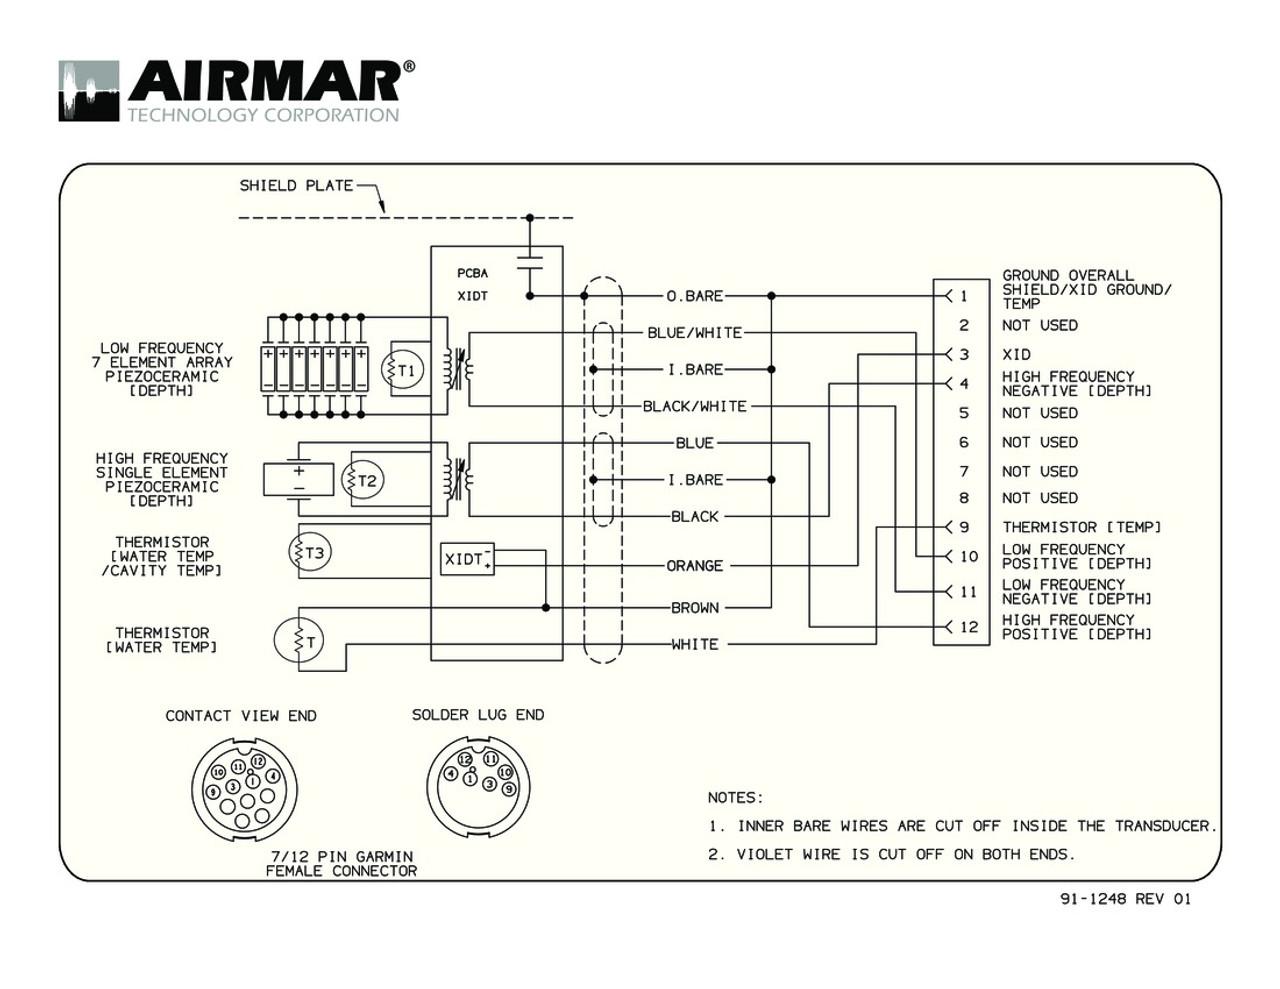 airmar wiring diagram cm275 blue bottle marine transducer for lowrance wiring diagrams transducer wiring diagram [ 1100 x 850 Pixel ]